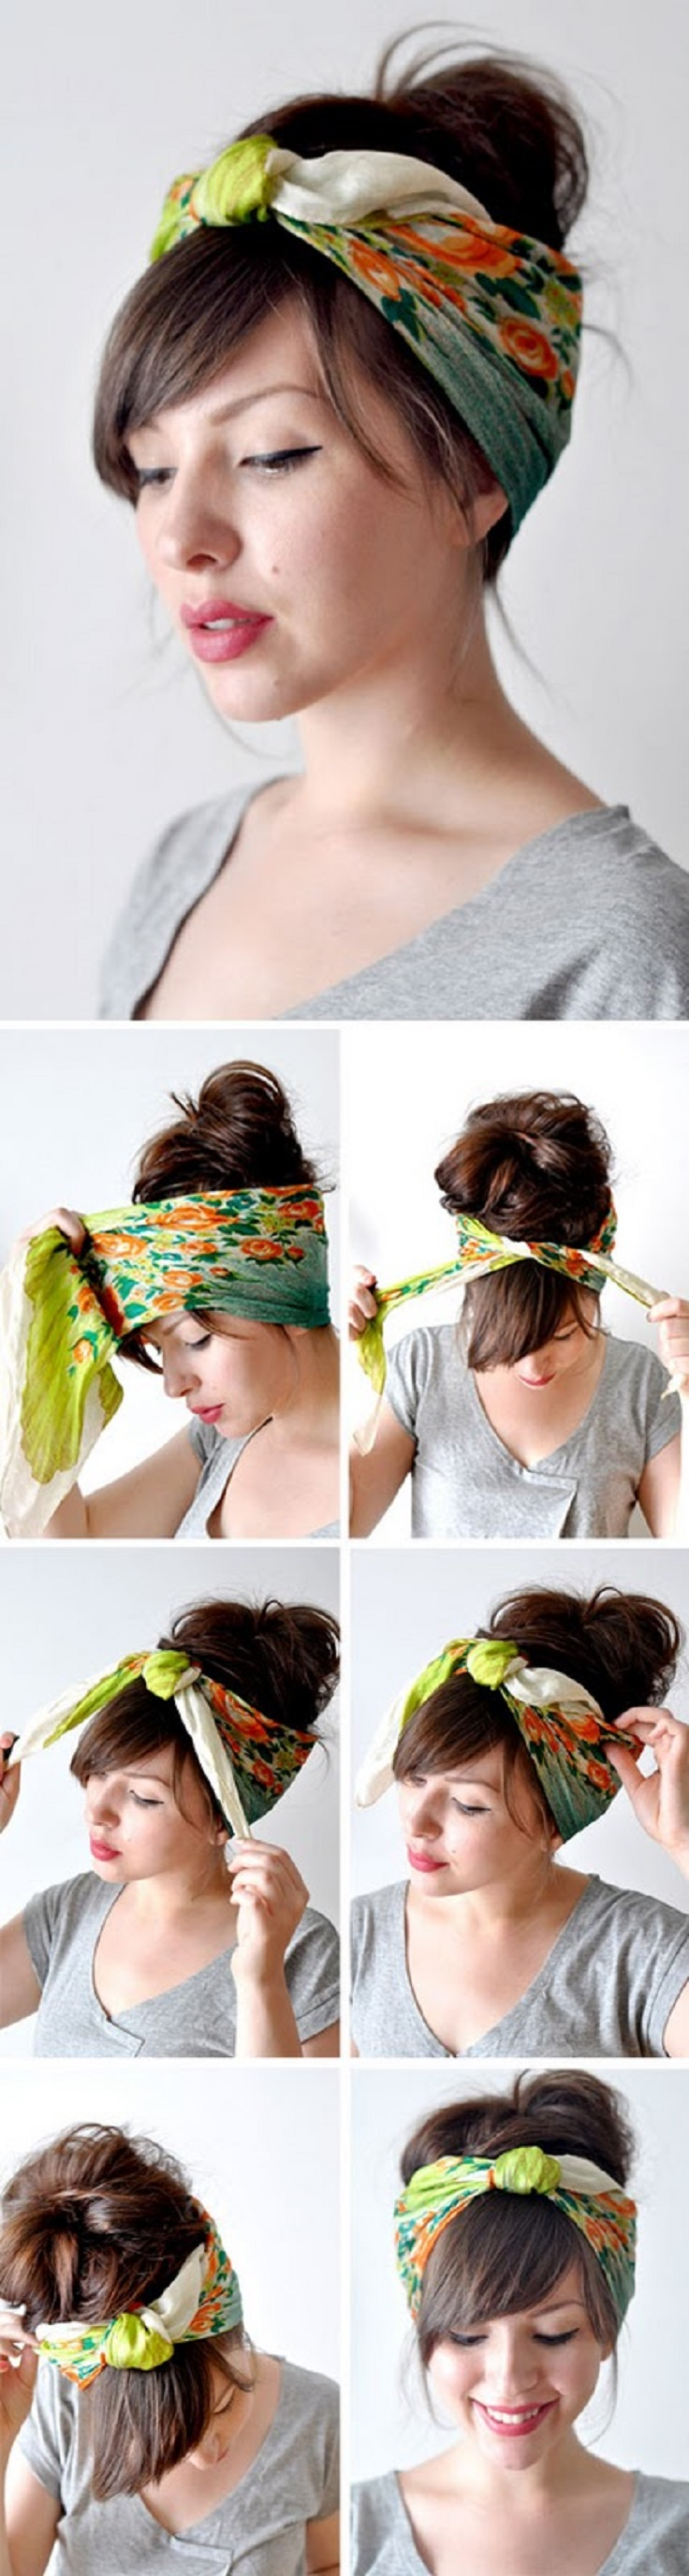 Bandana Hairstyles Top 10 Simple Ways Tutorials Top Inspired